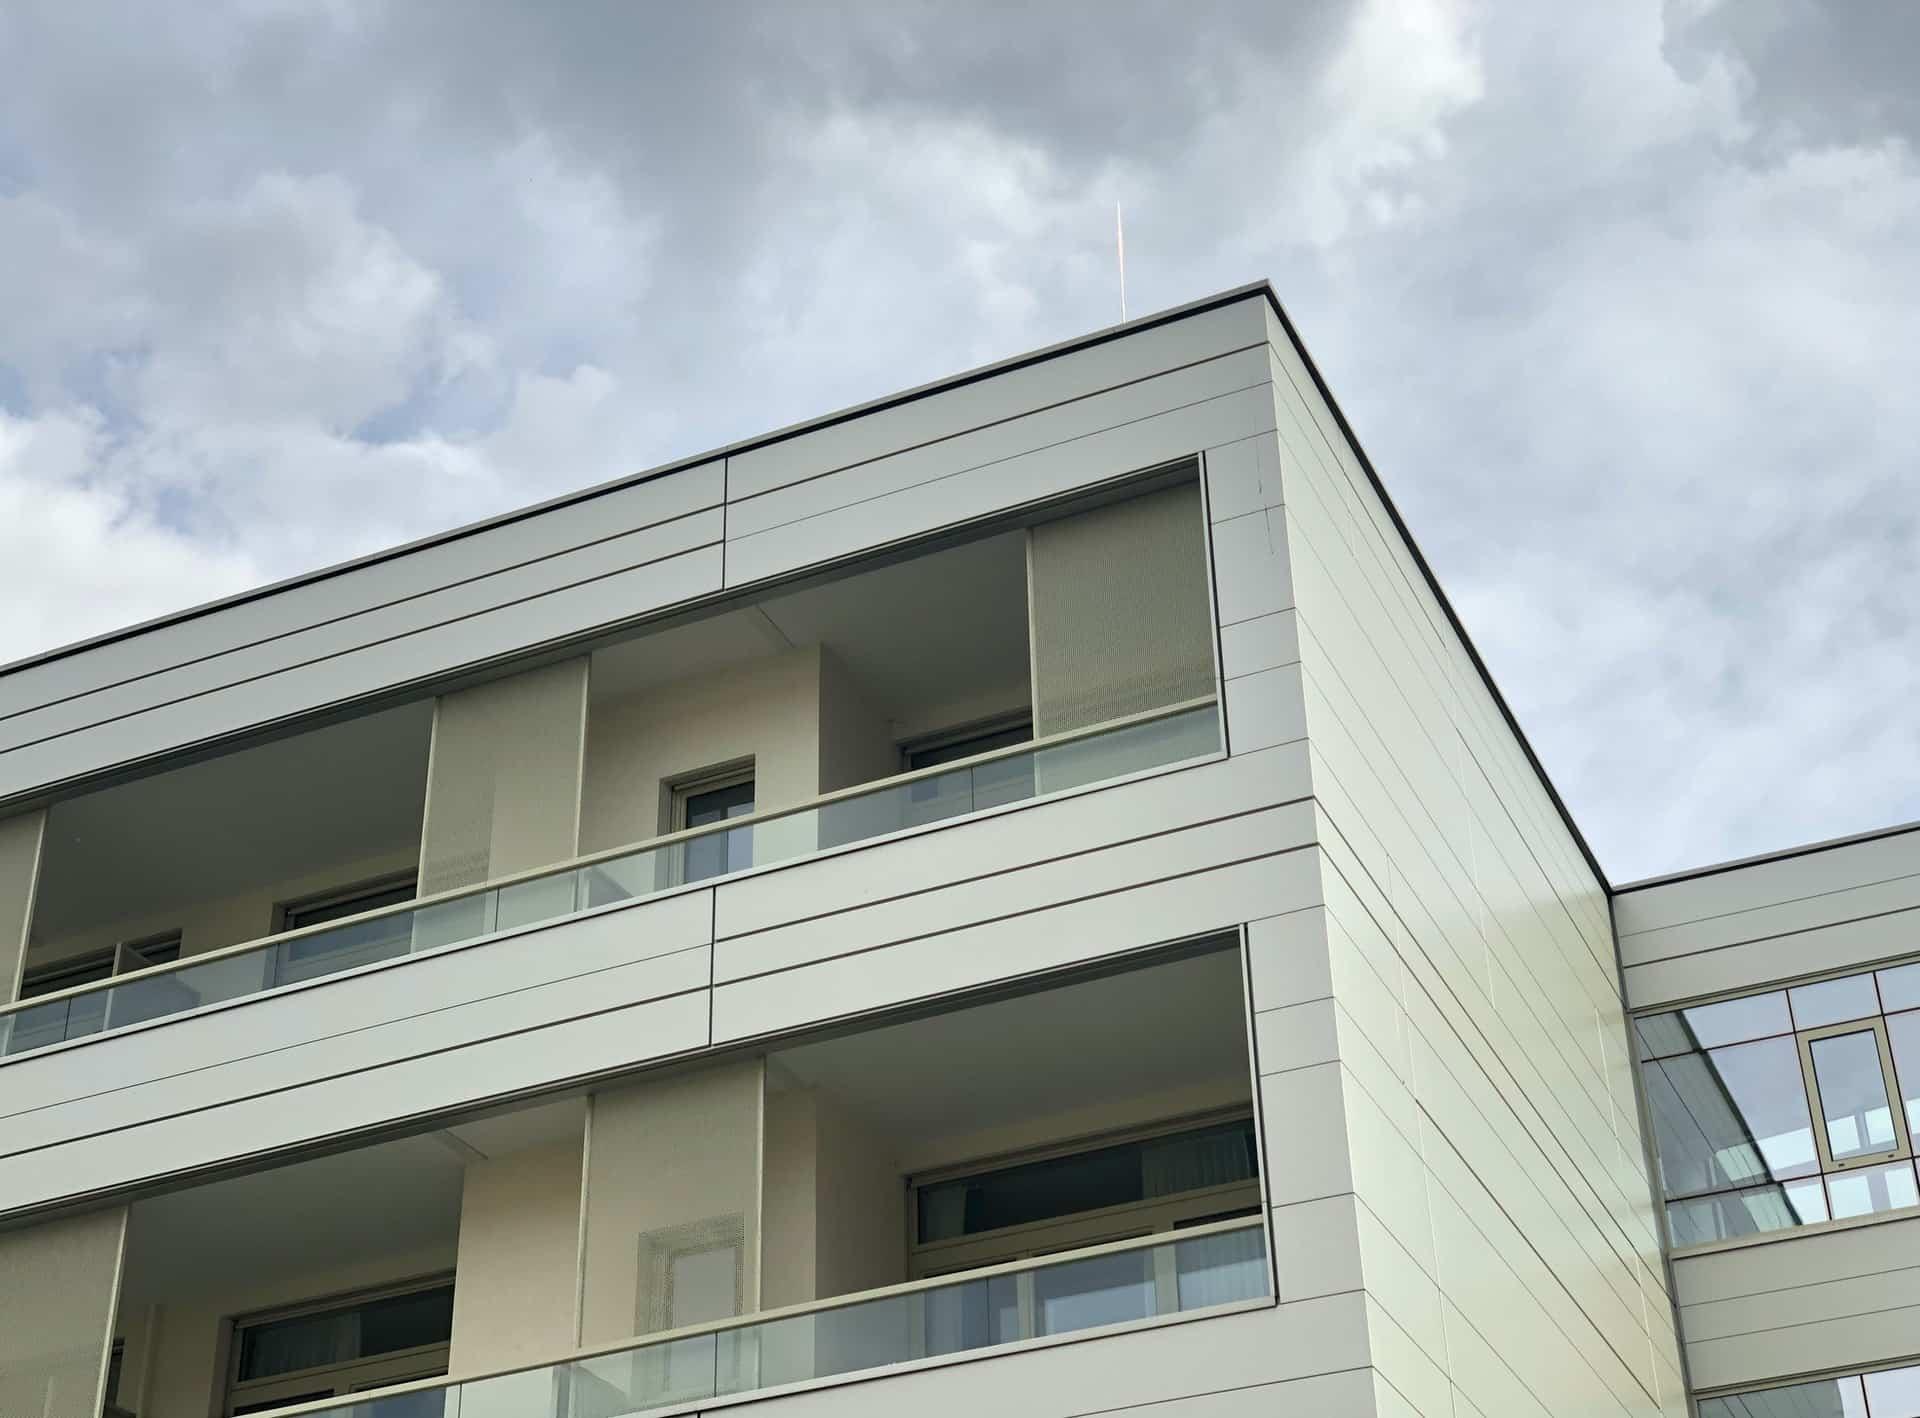 commercial roof leak